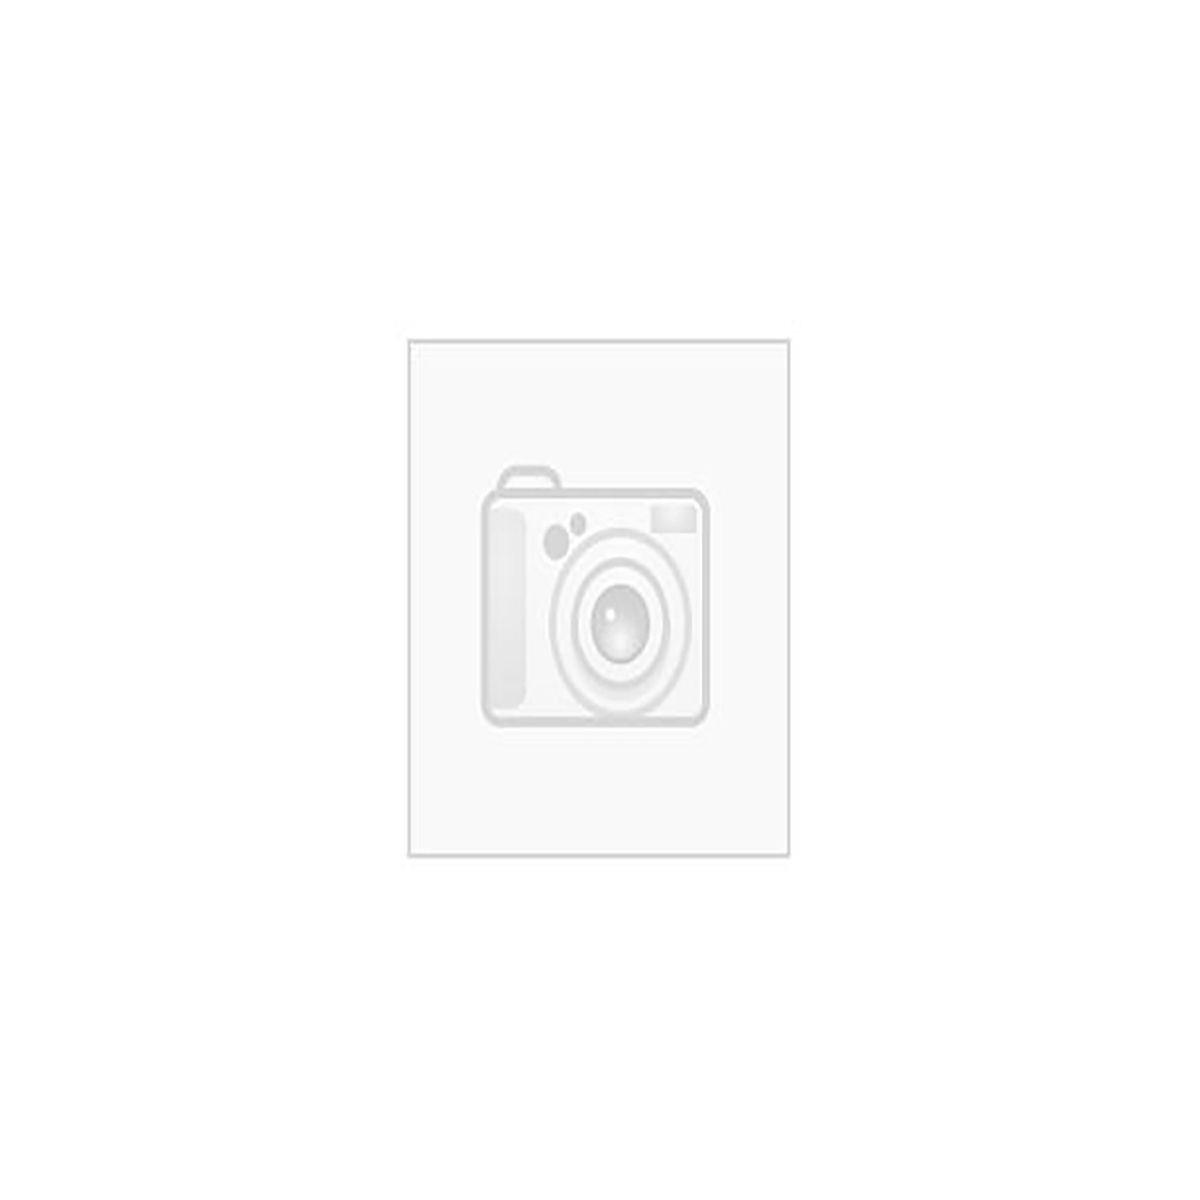 VikingBad - MIE 50SLIM srvSkap S:hvit mt/F:hvit høyglans